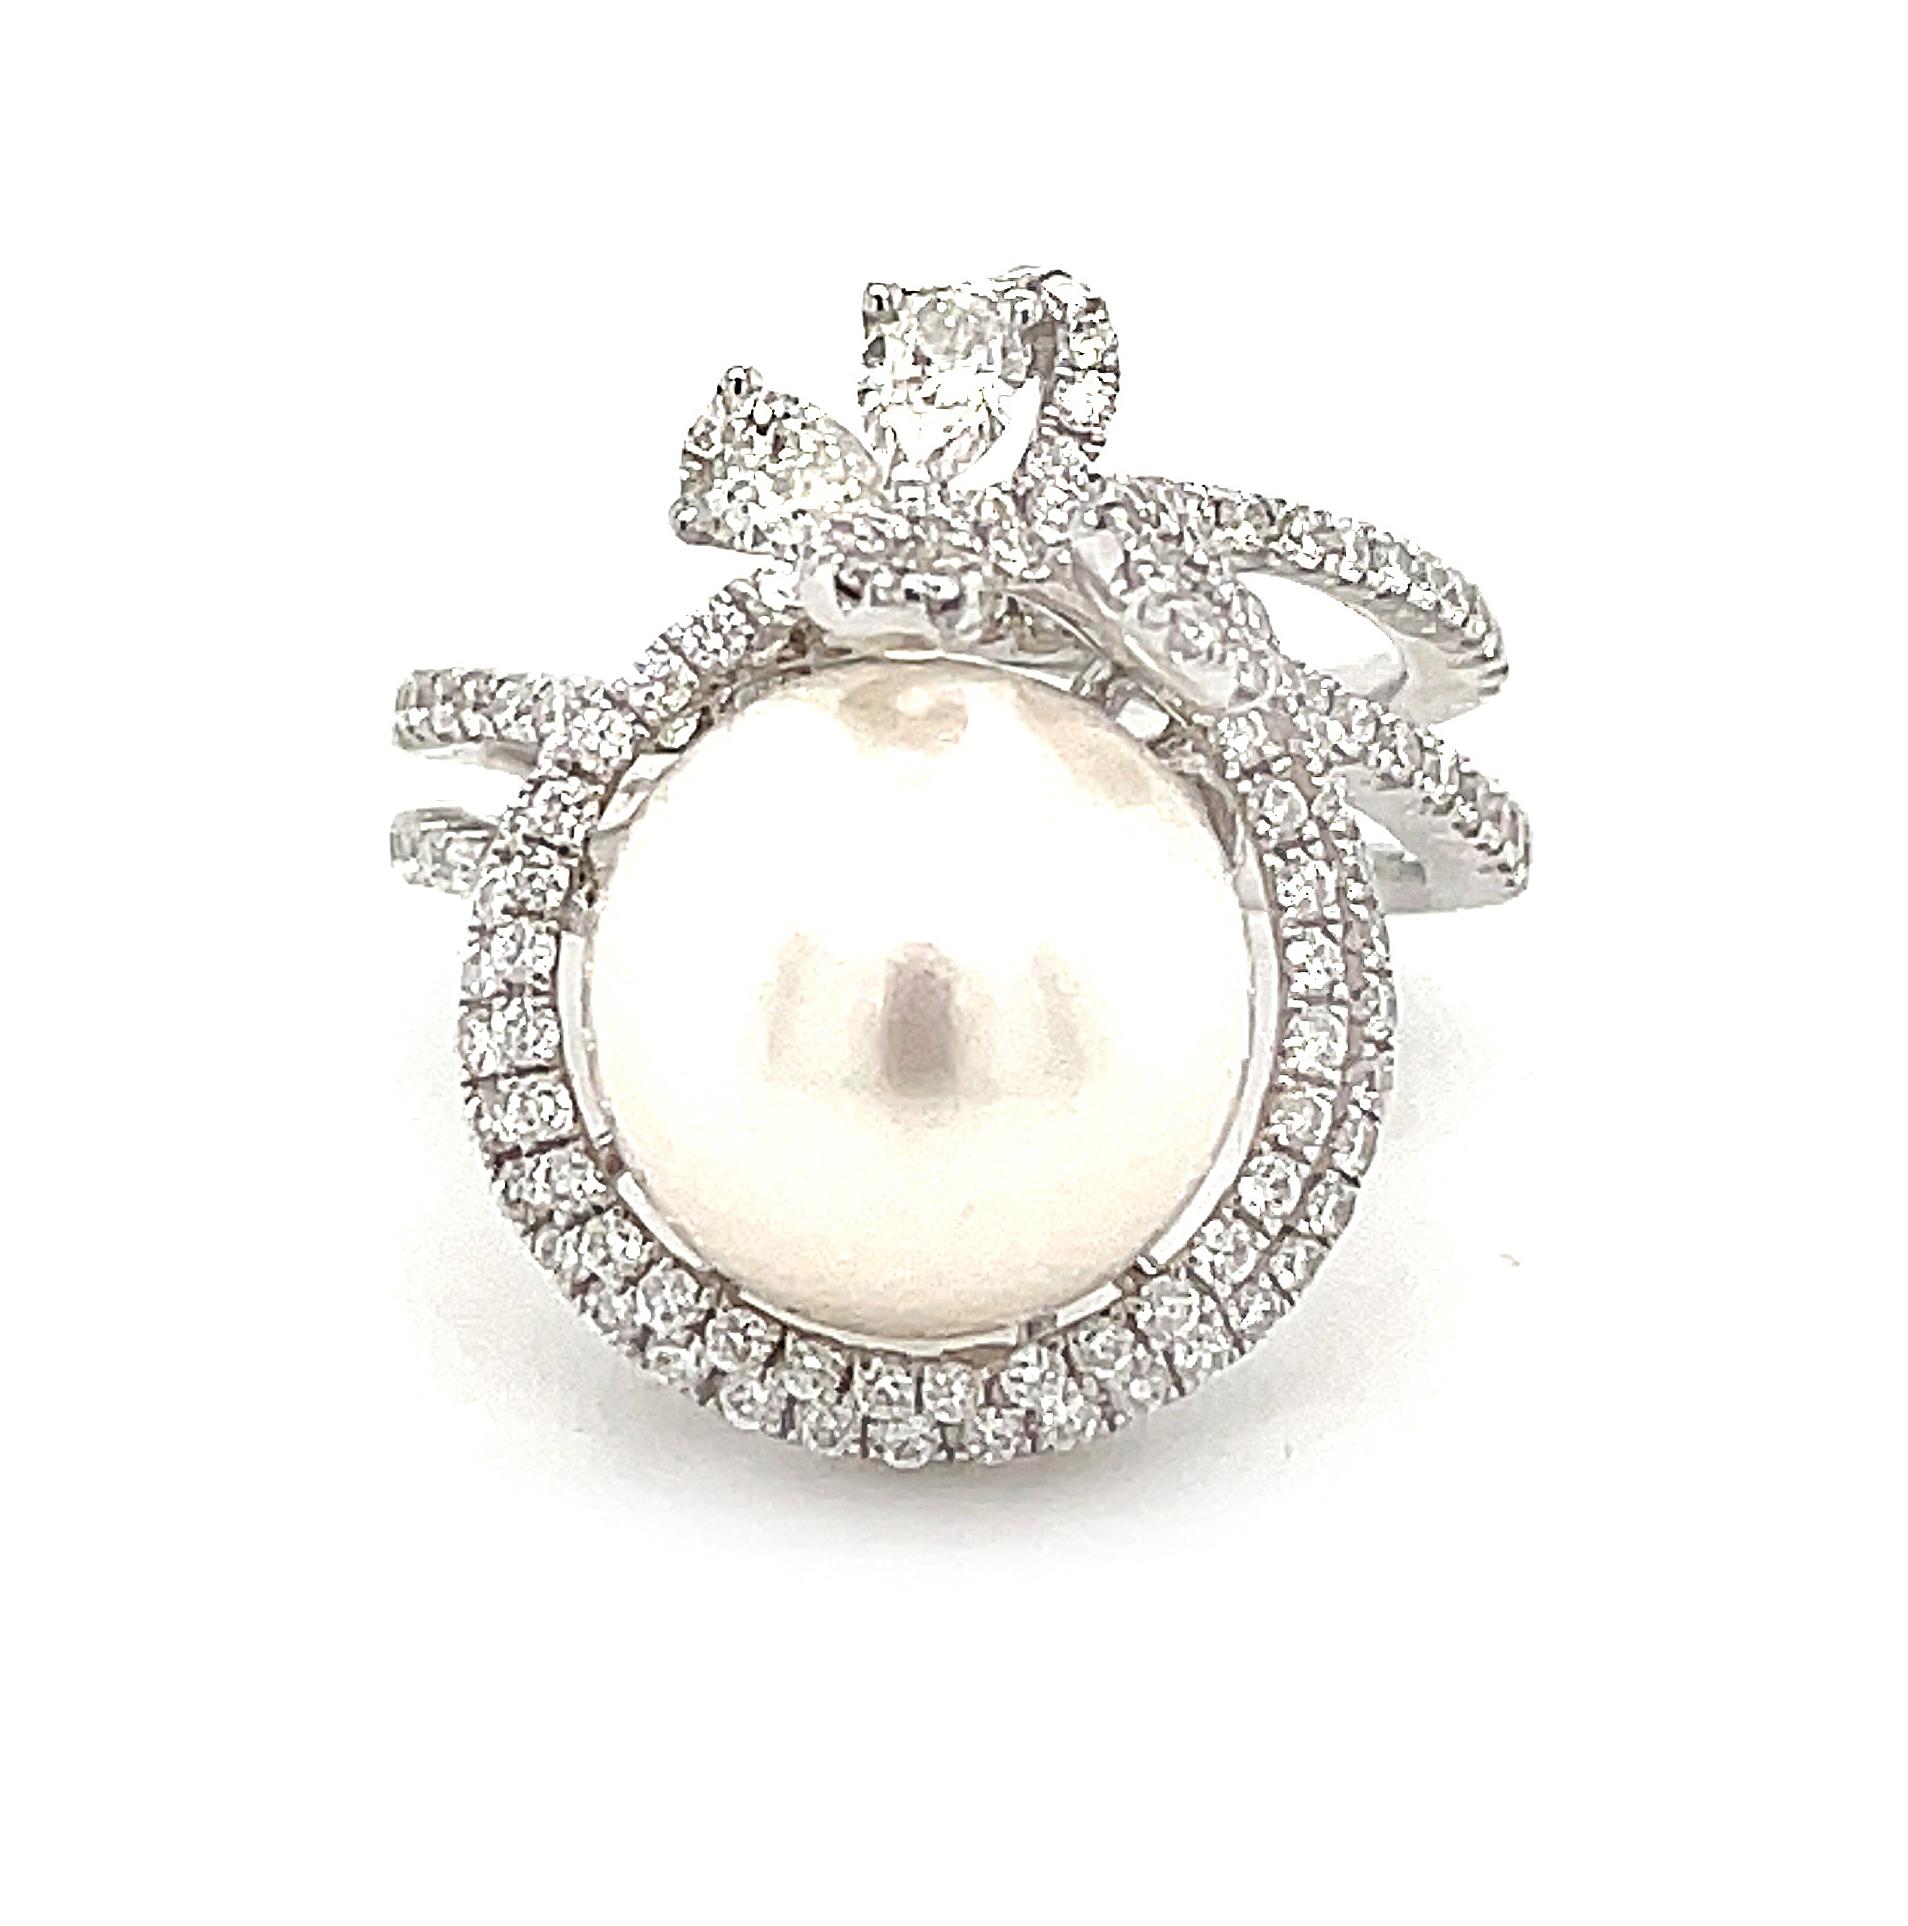 18k White Gold 11-11.5mm Pearl & Brilliant Cut Diamond Dress Ring